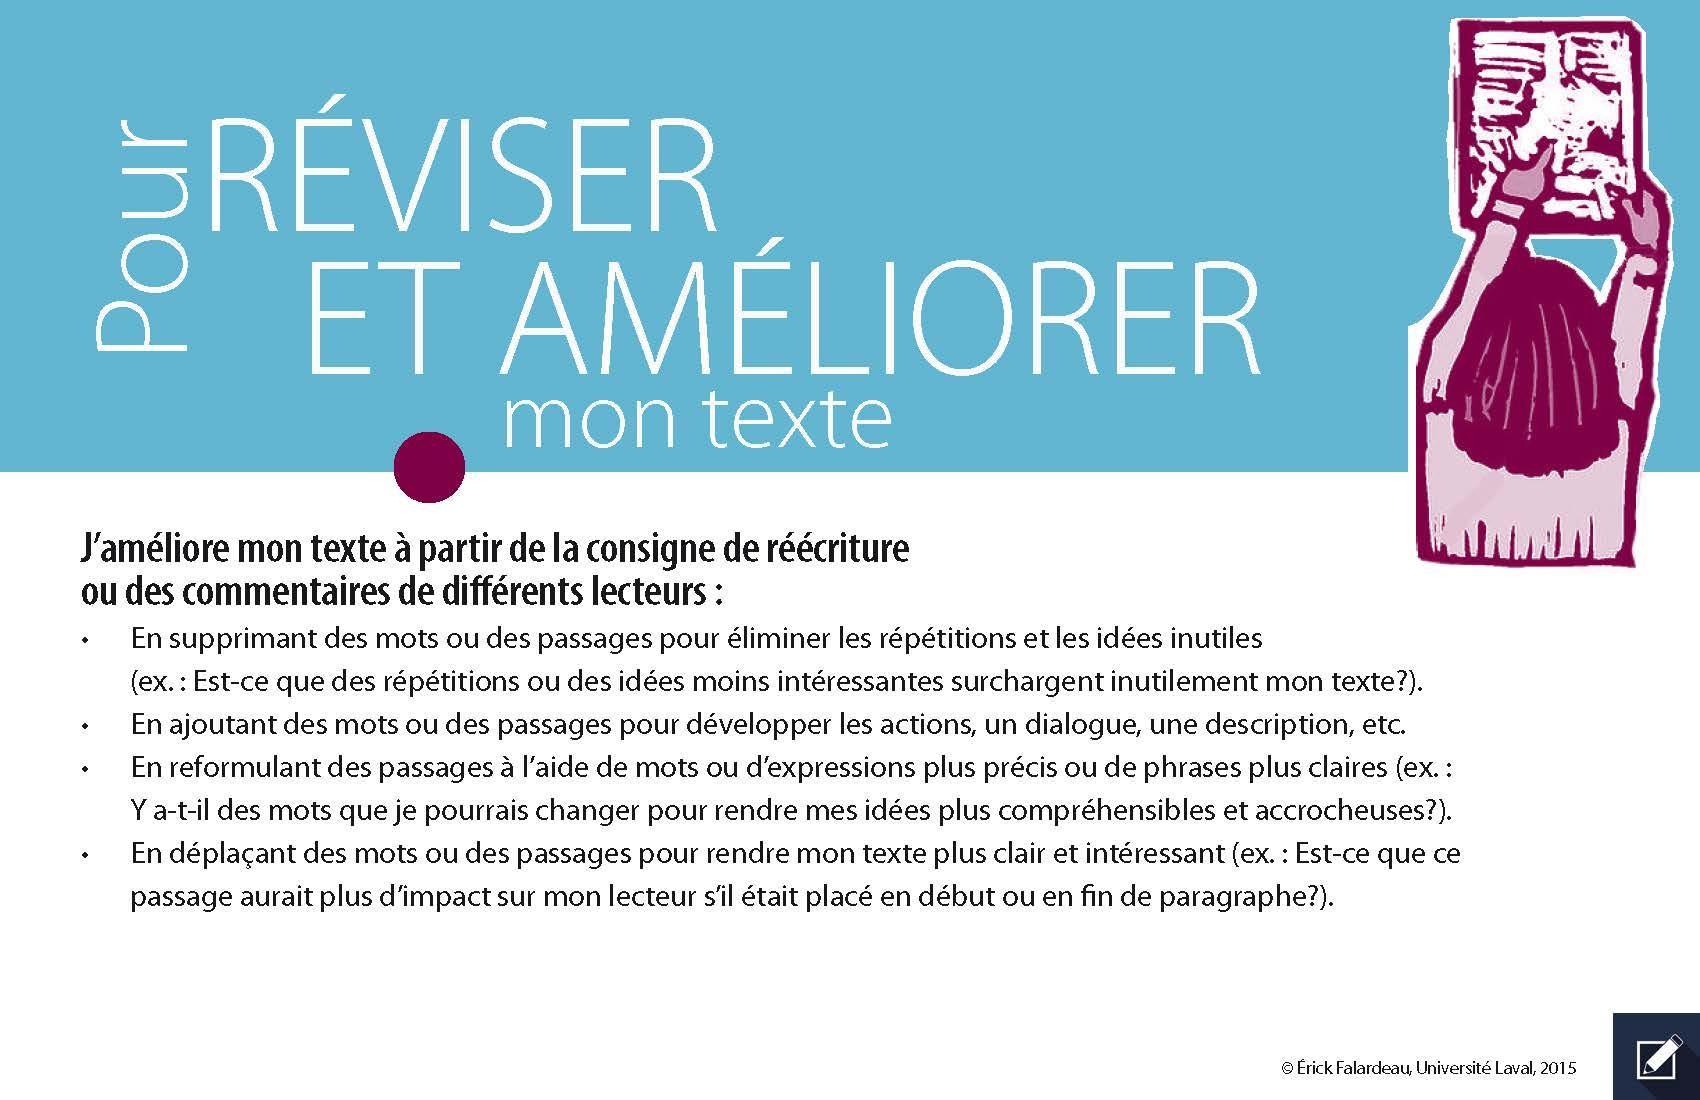 REVISERameliorer.texte.2